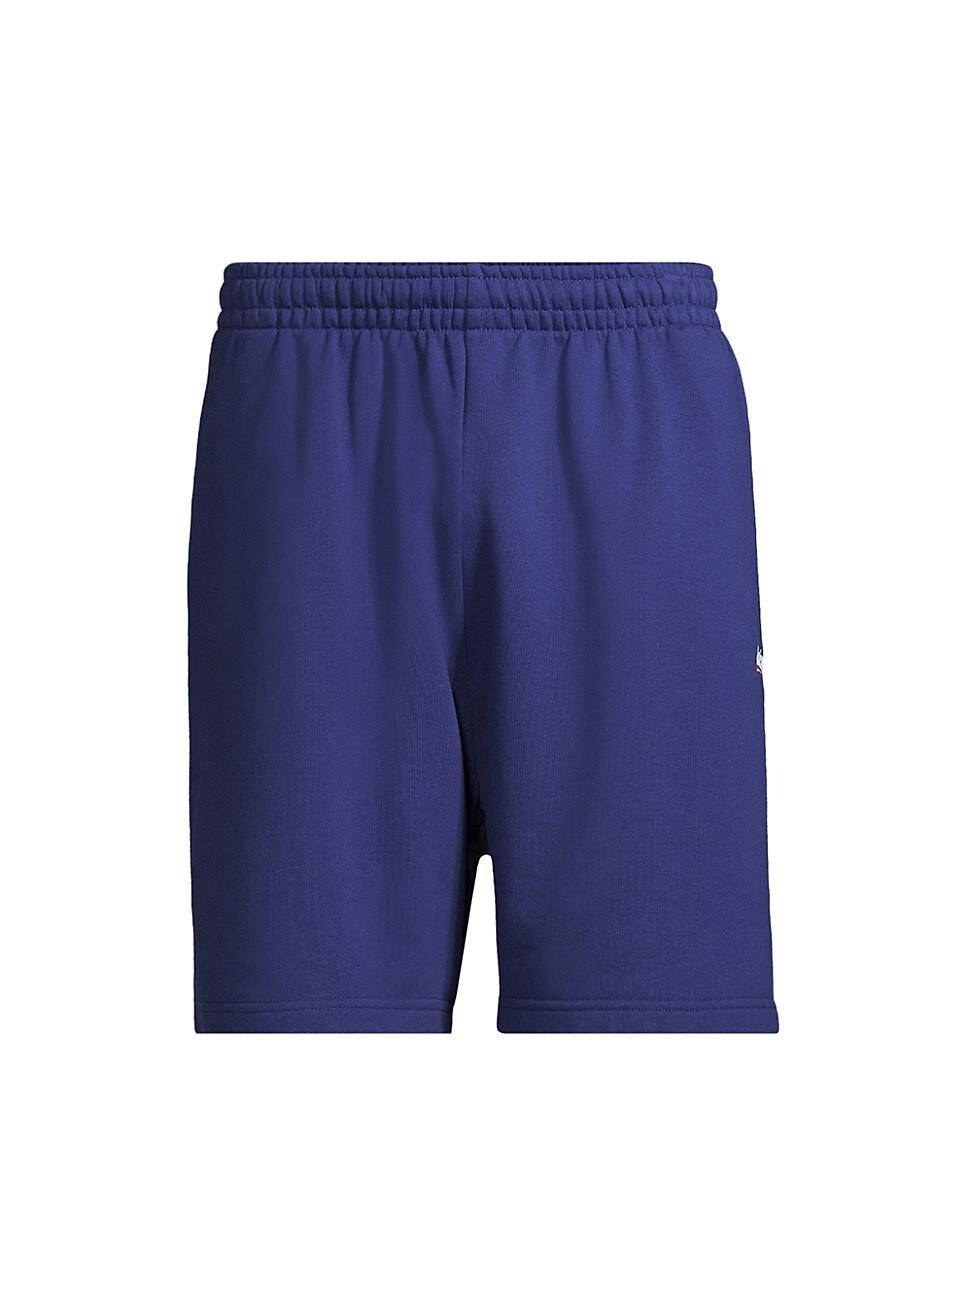 Balenciaga Campaign Logo-embroidered Sweat Shorts In Pacific Blue/ White